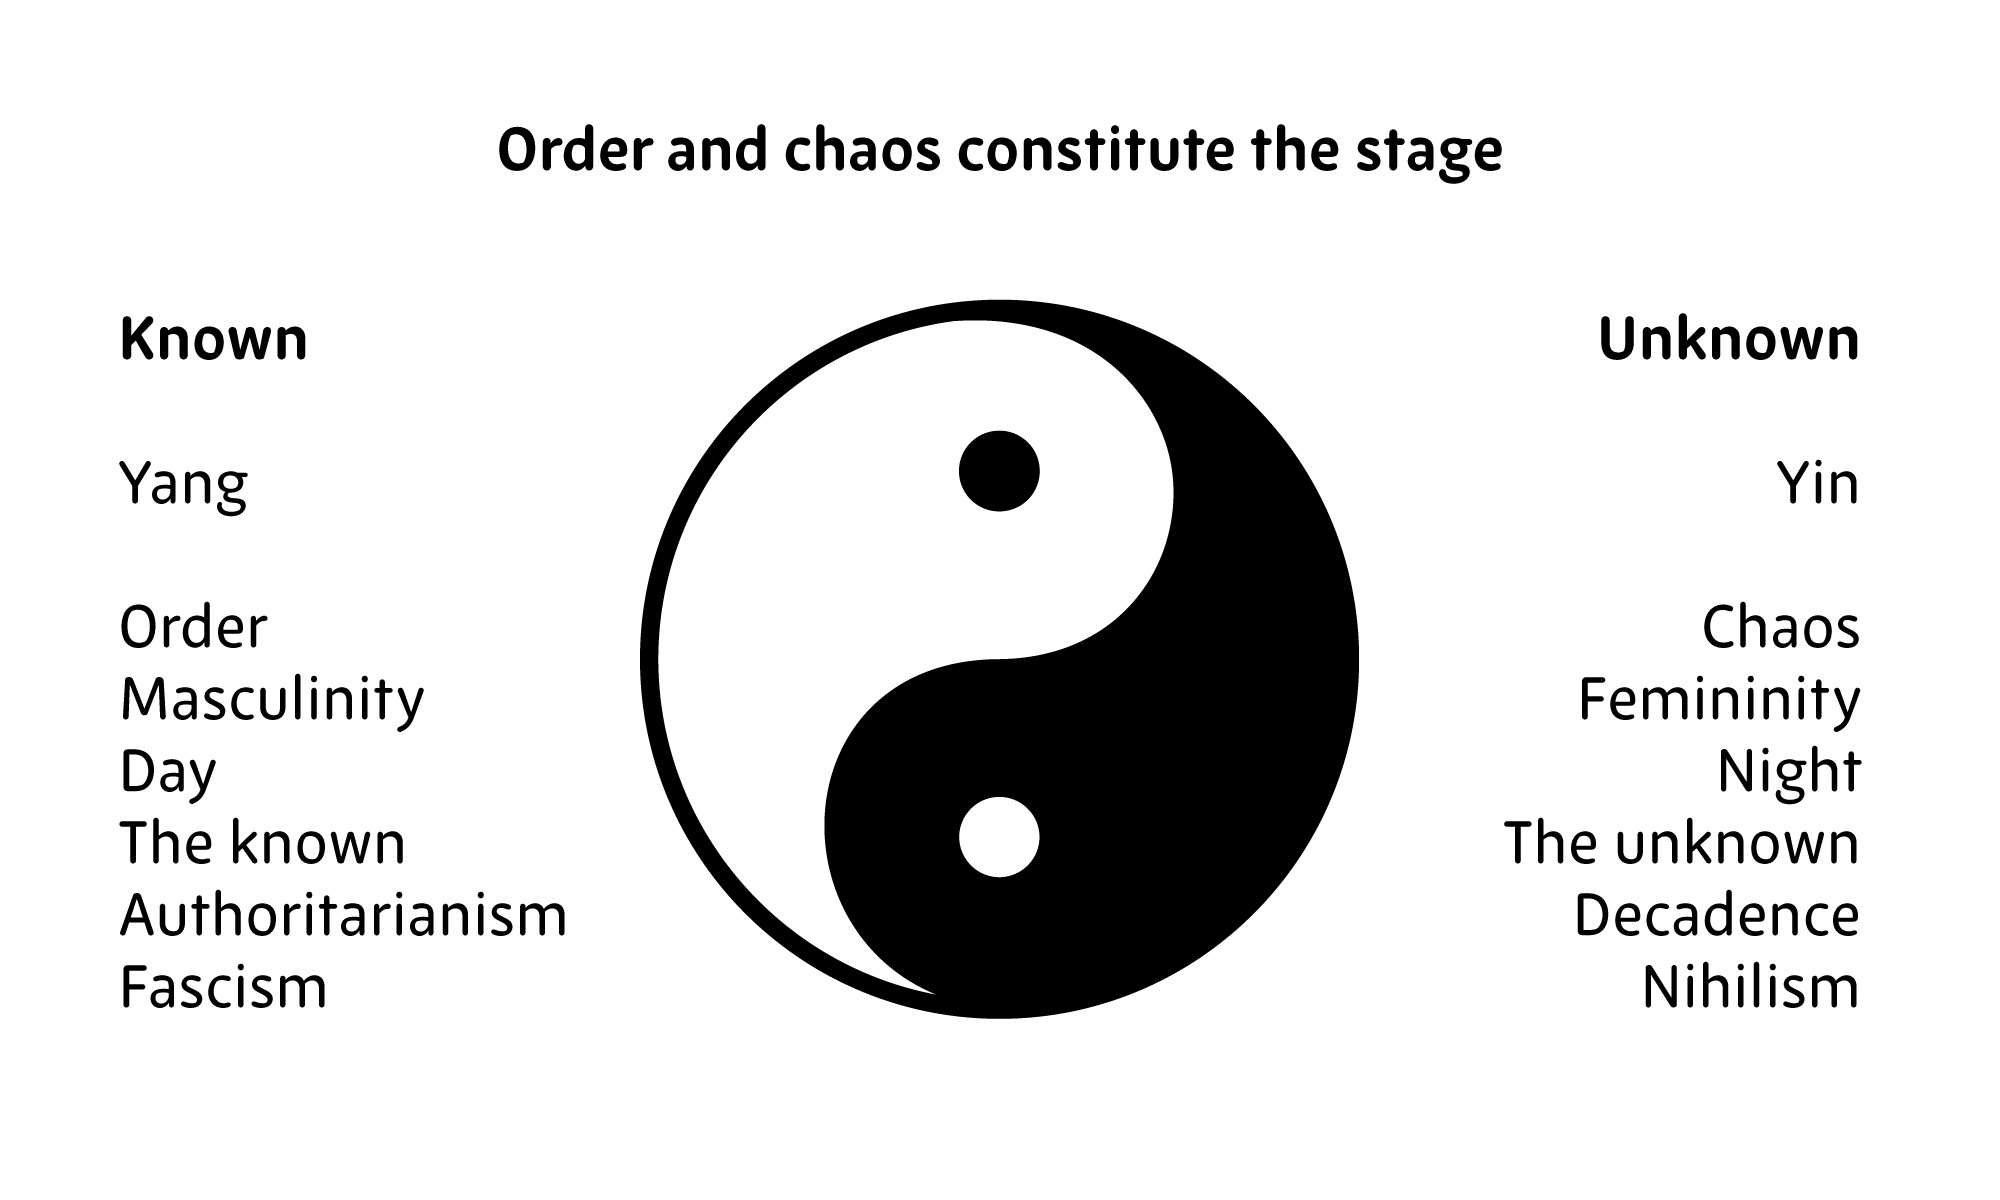 yin yang symbol order chaos